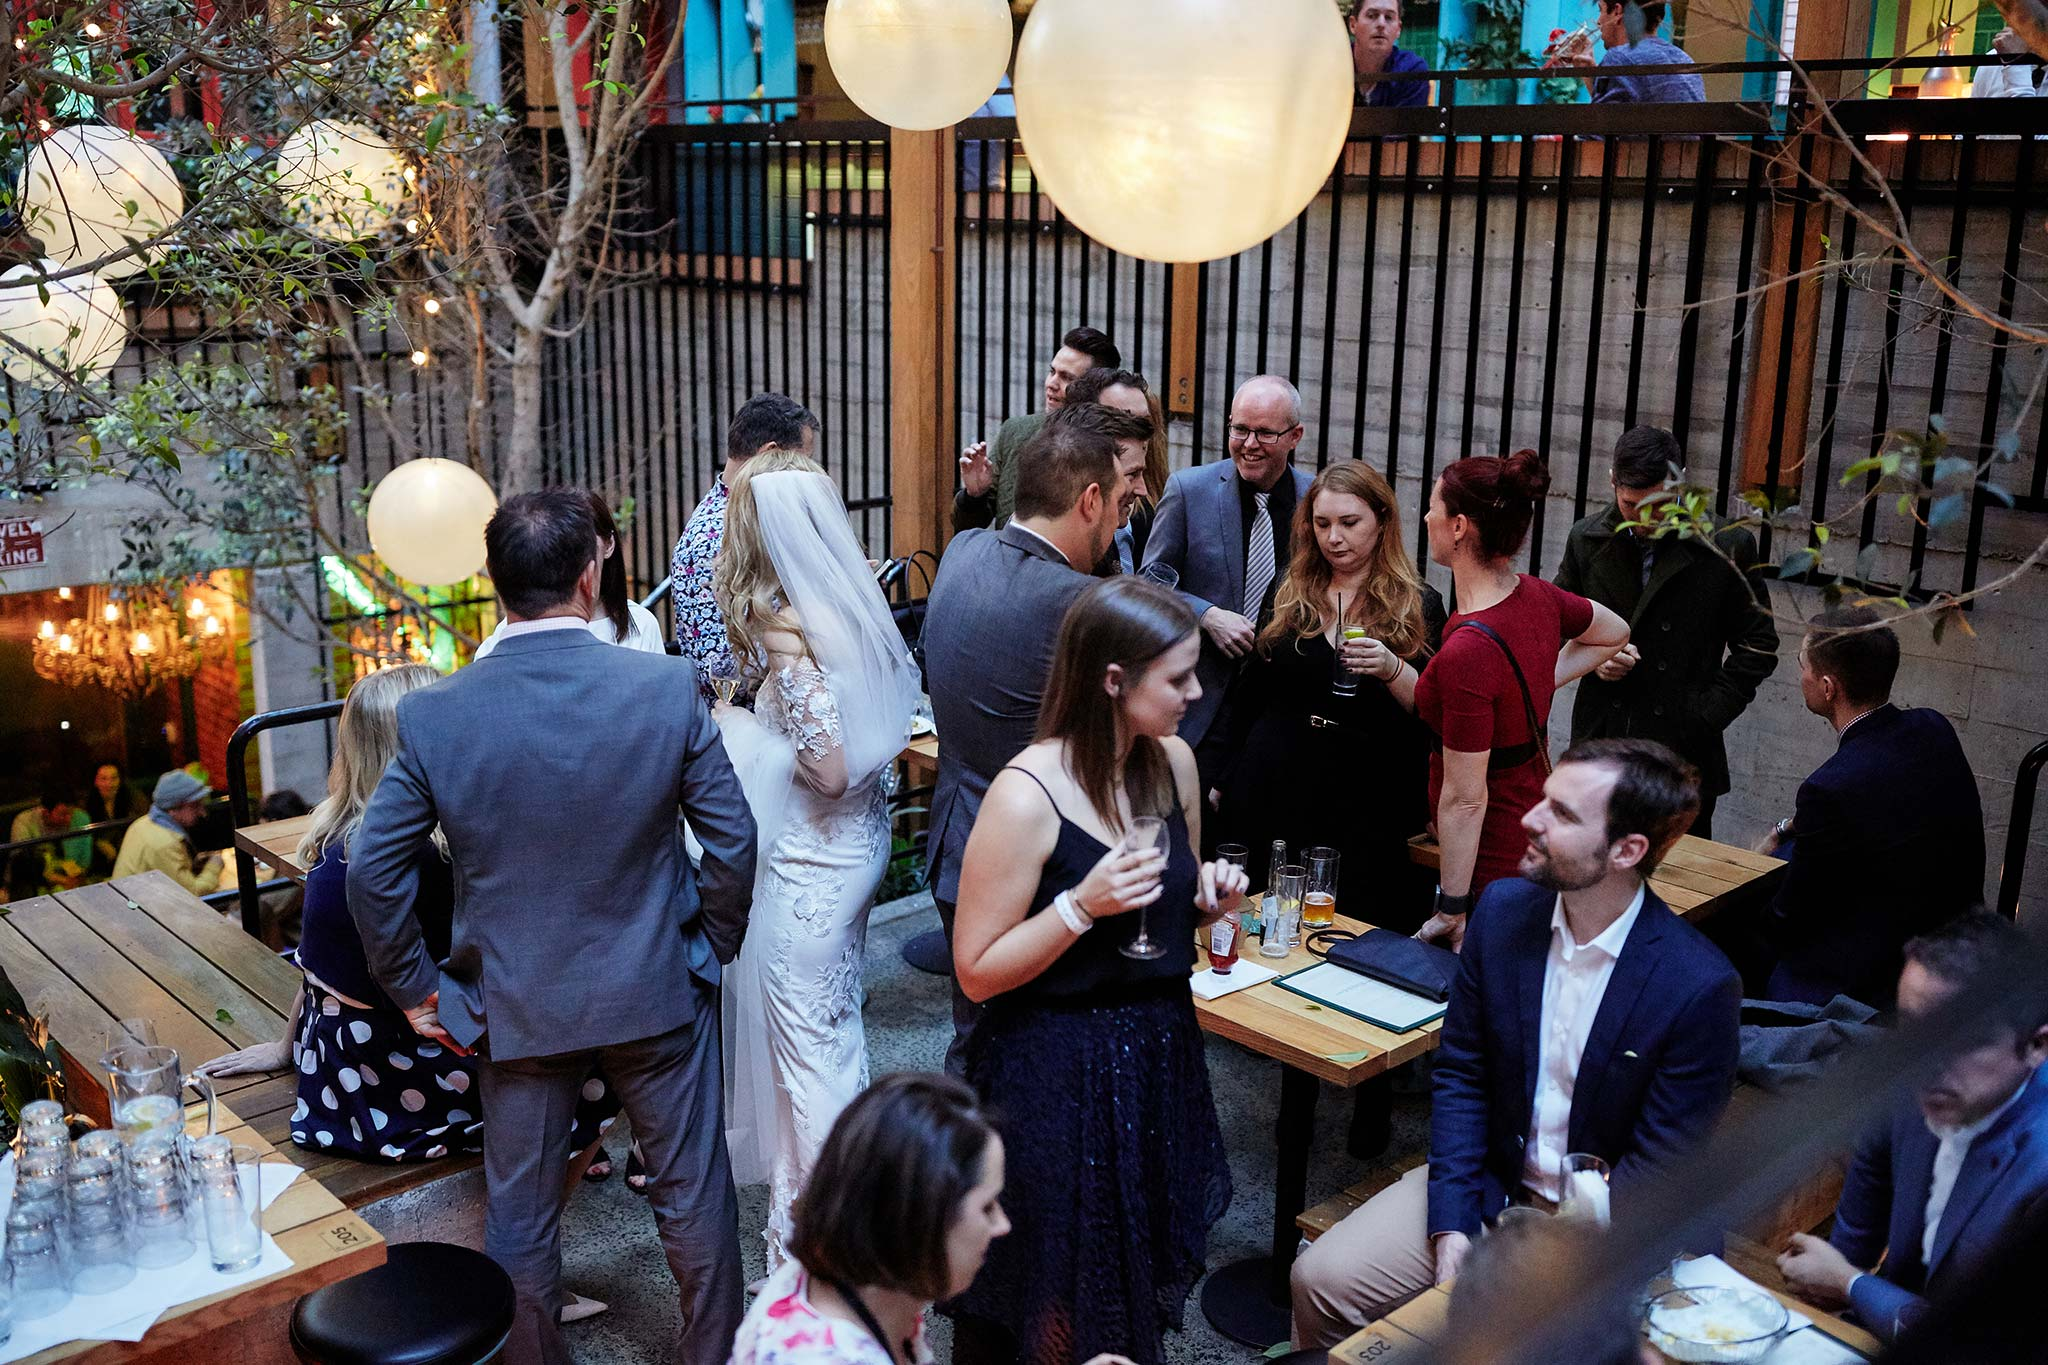 Melbourne-tour-bus-wedding-photographer-garden-state-hotel-lunch-drinks